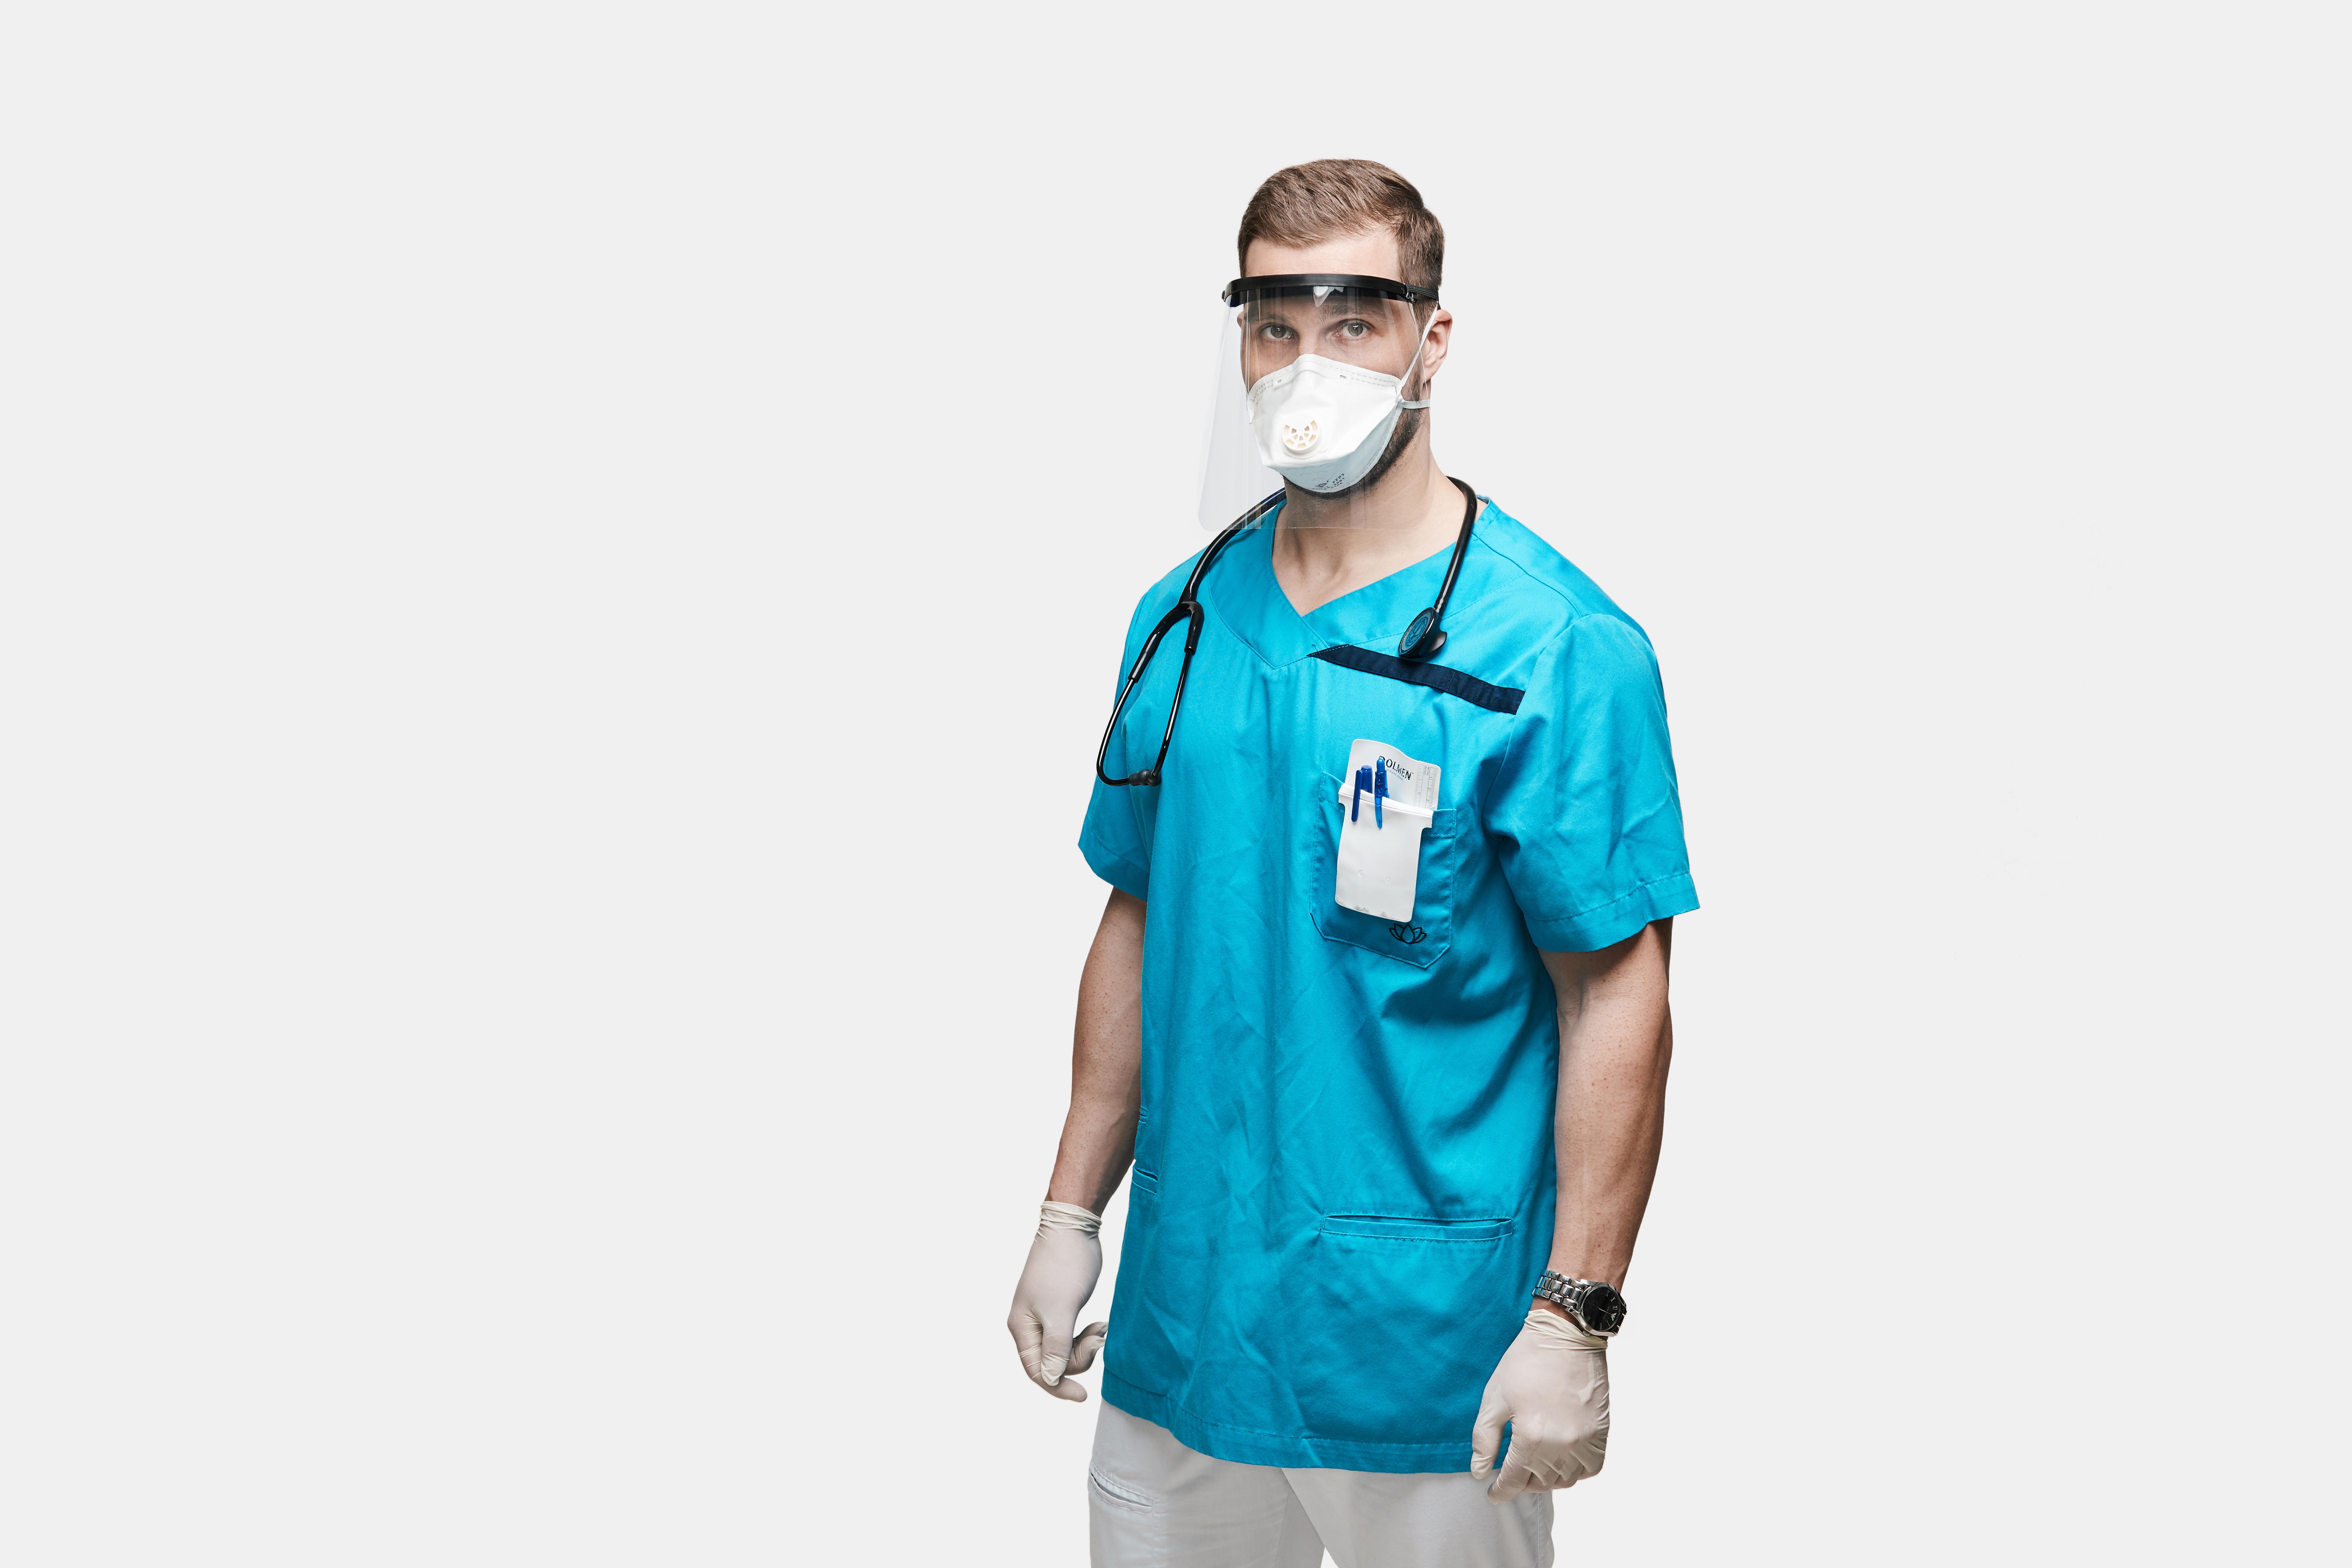 Meditsiinitöötaja kaitsevisiiriga